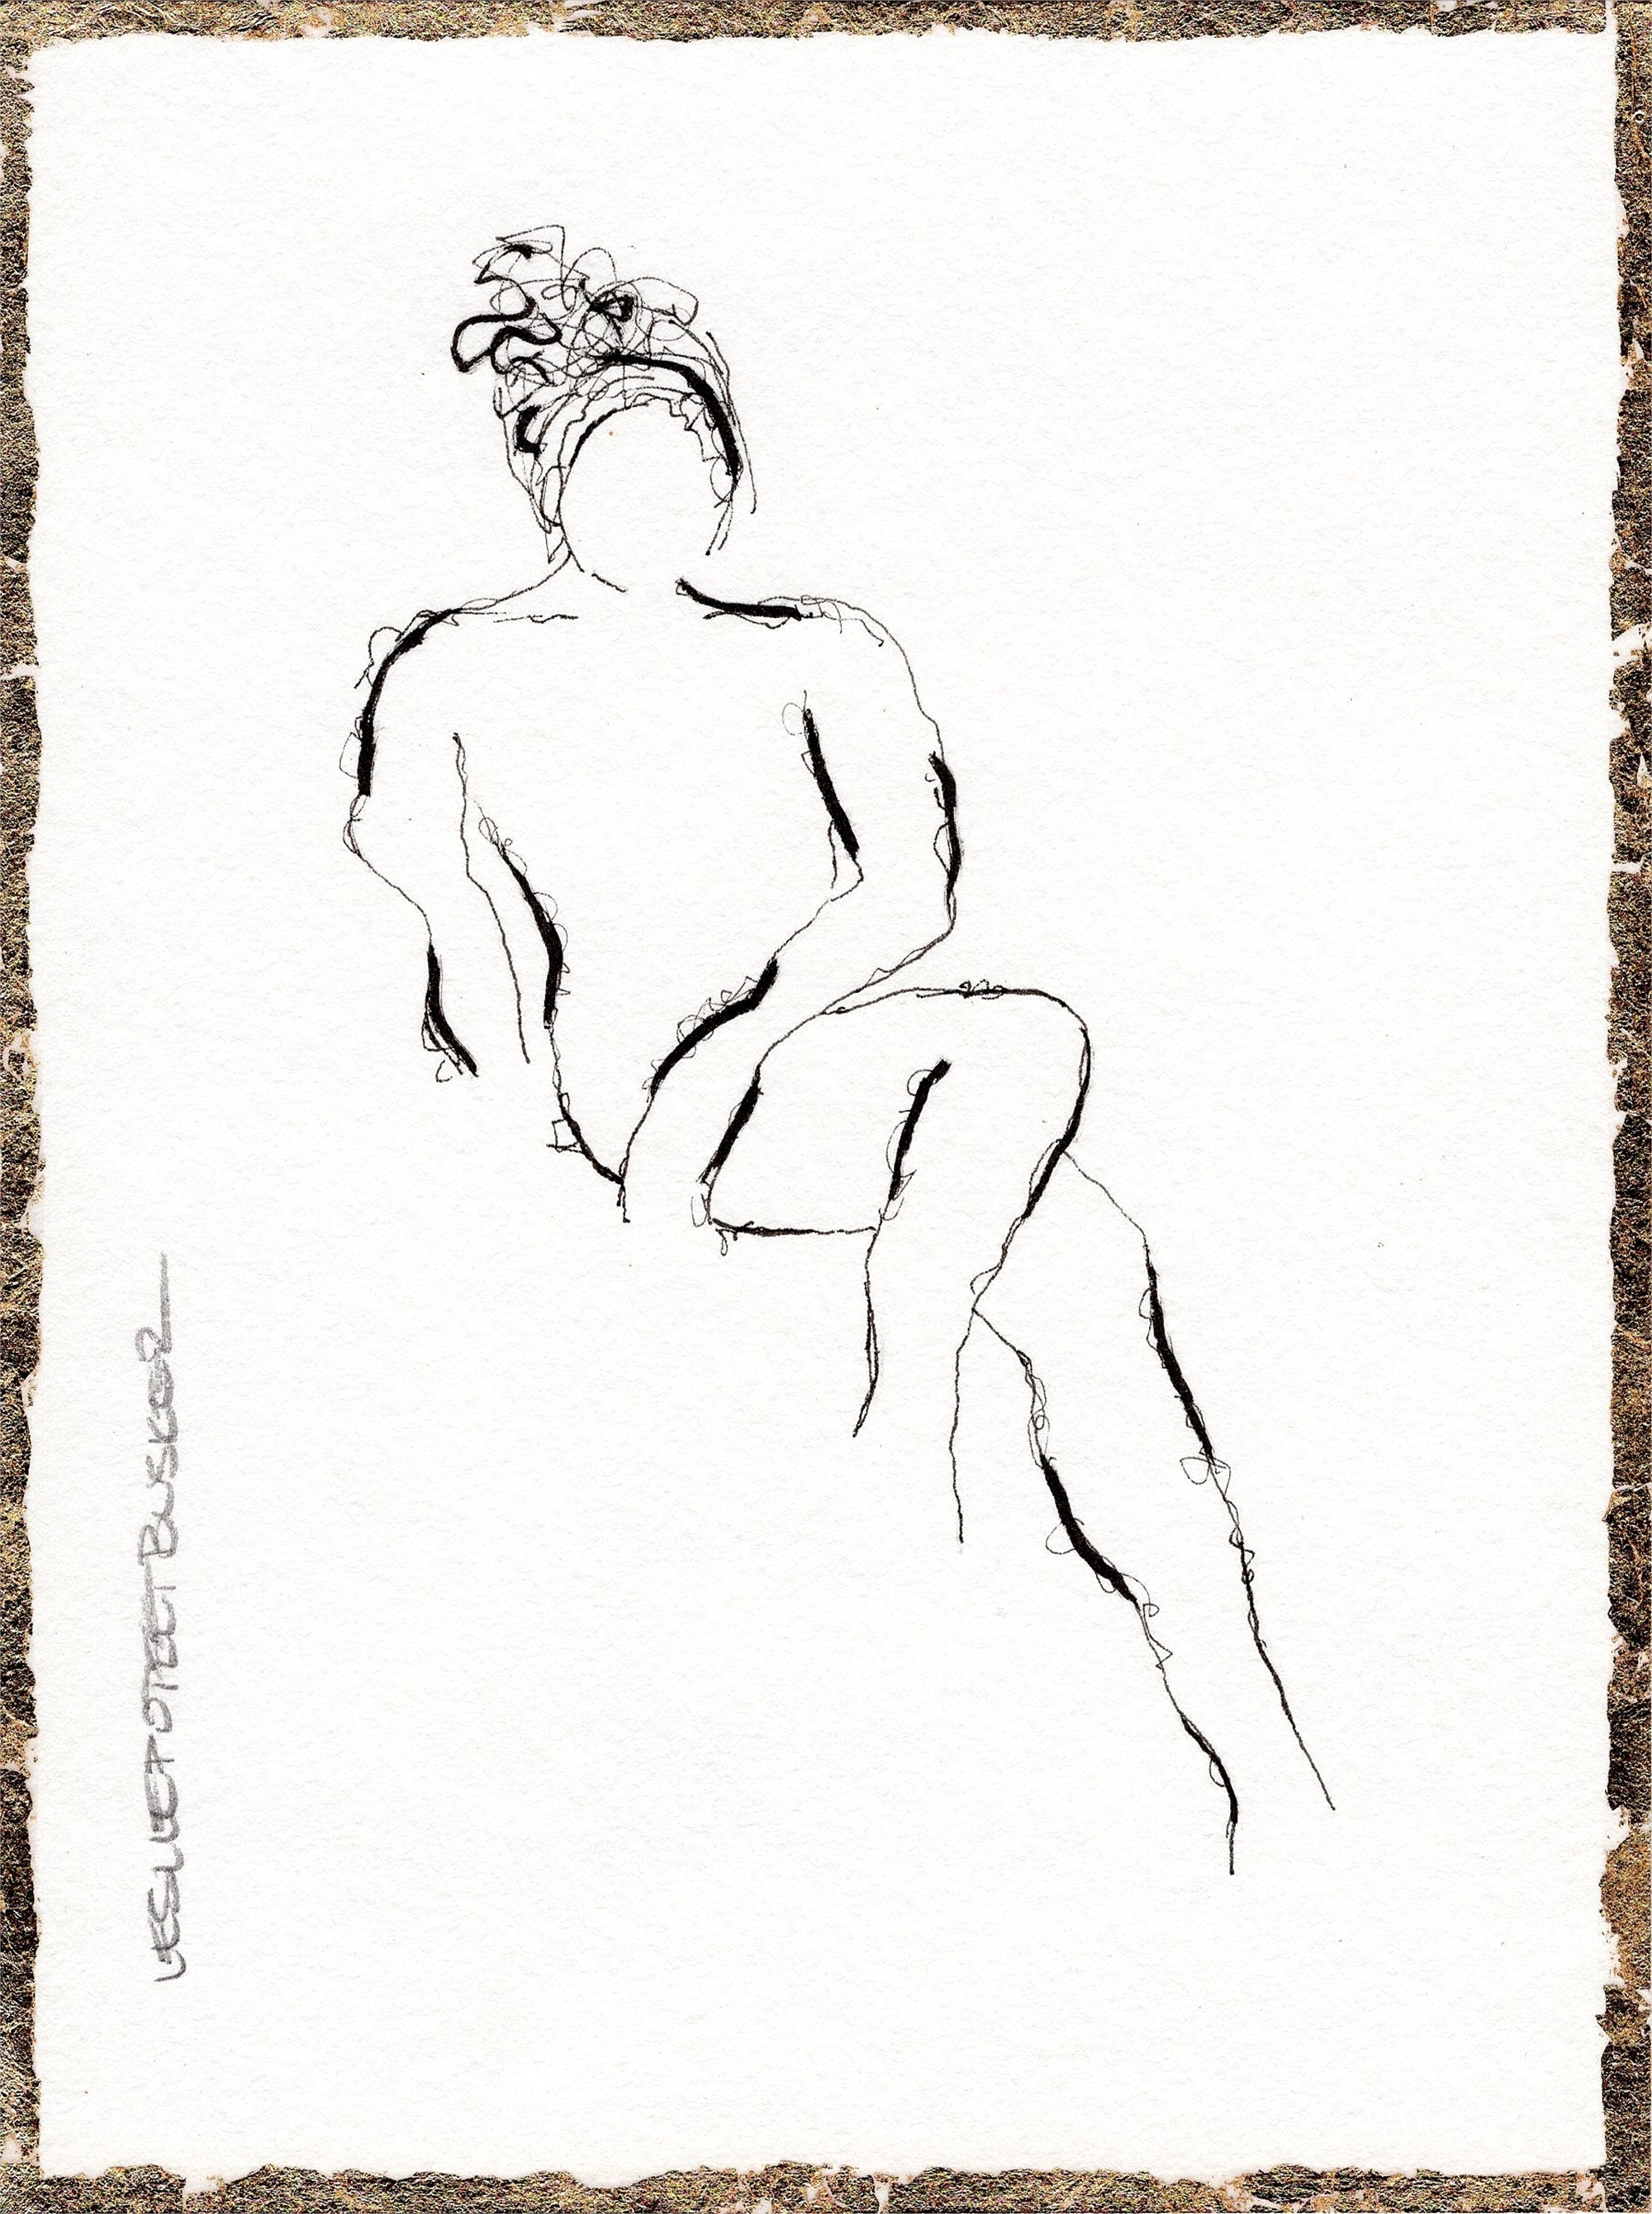 Figure No. 134 by Leslie Poteet Busker